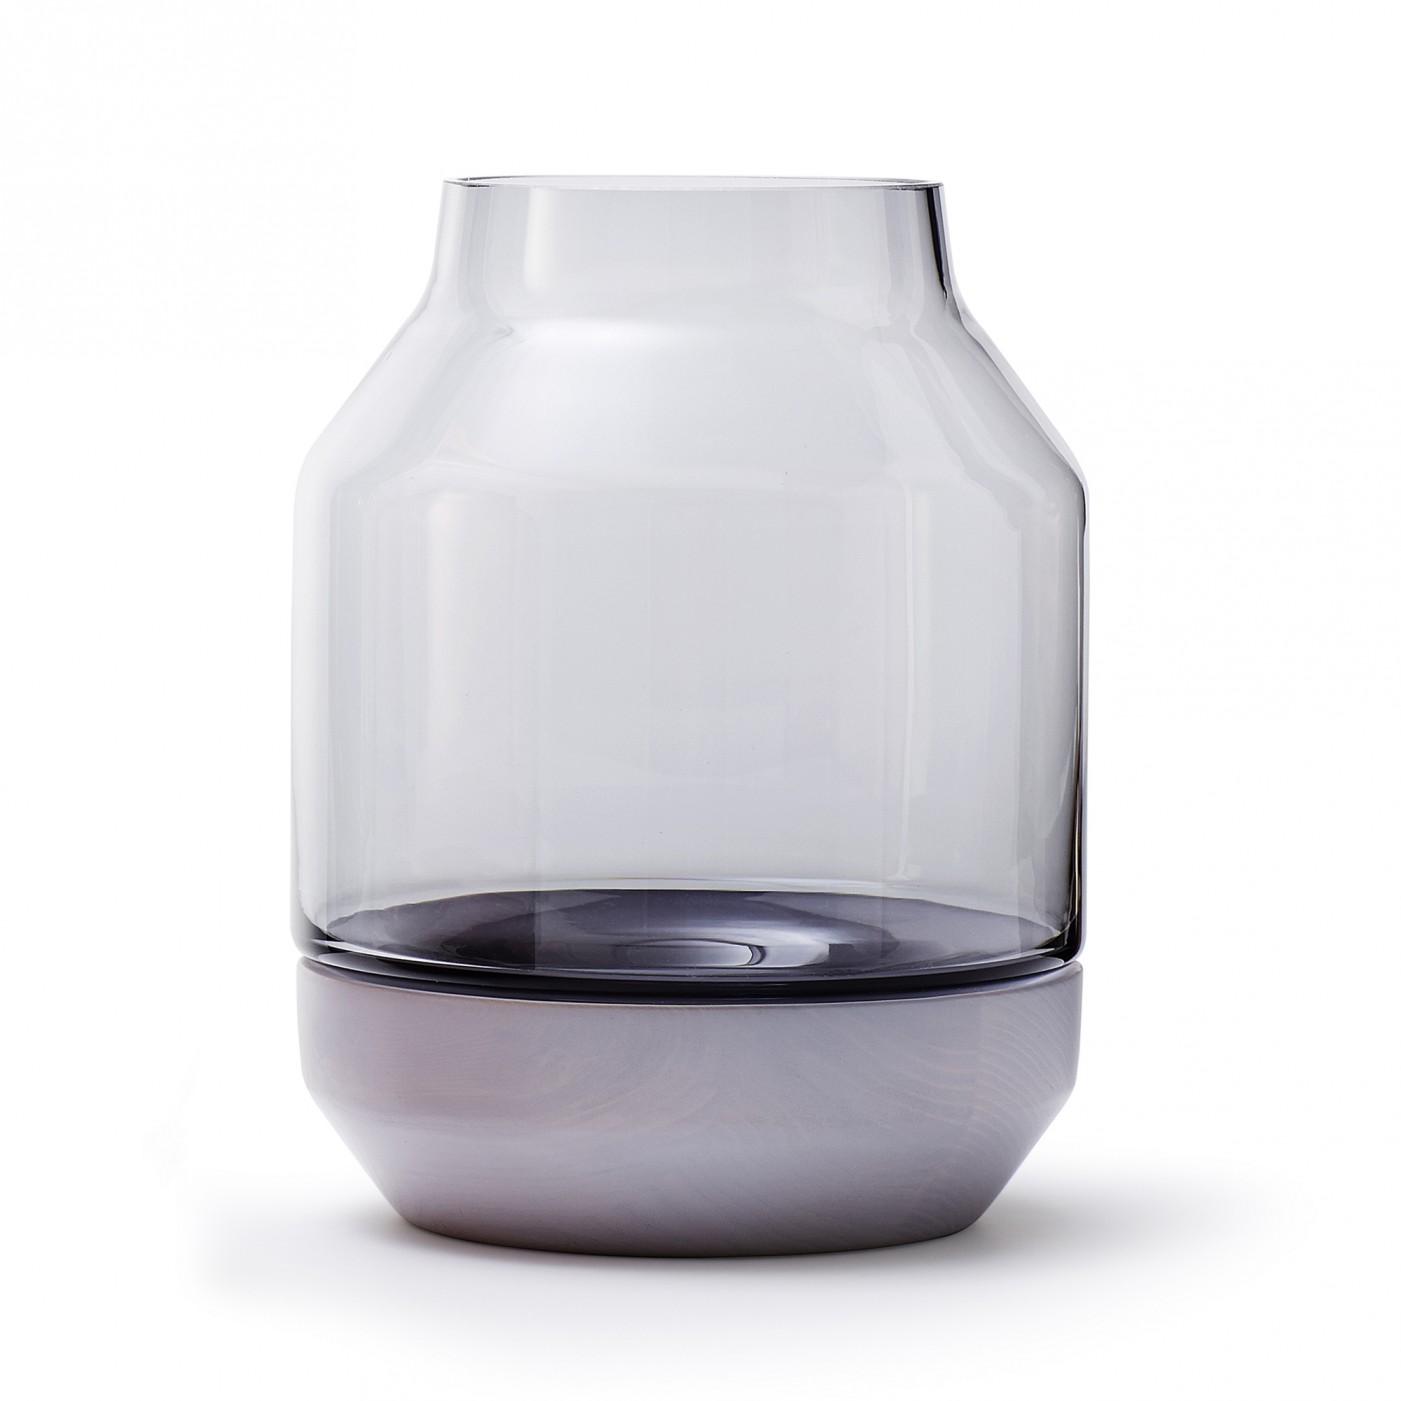 'Elevated' vase in grey